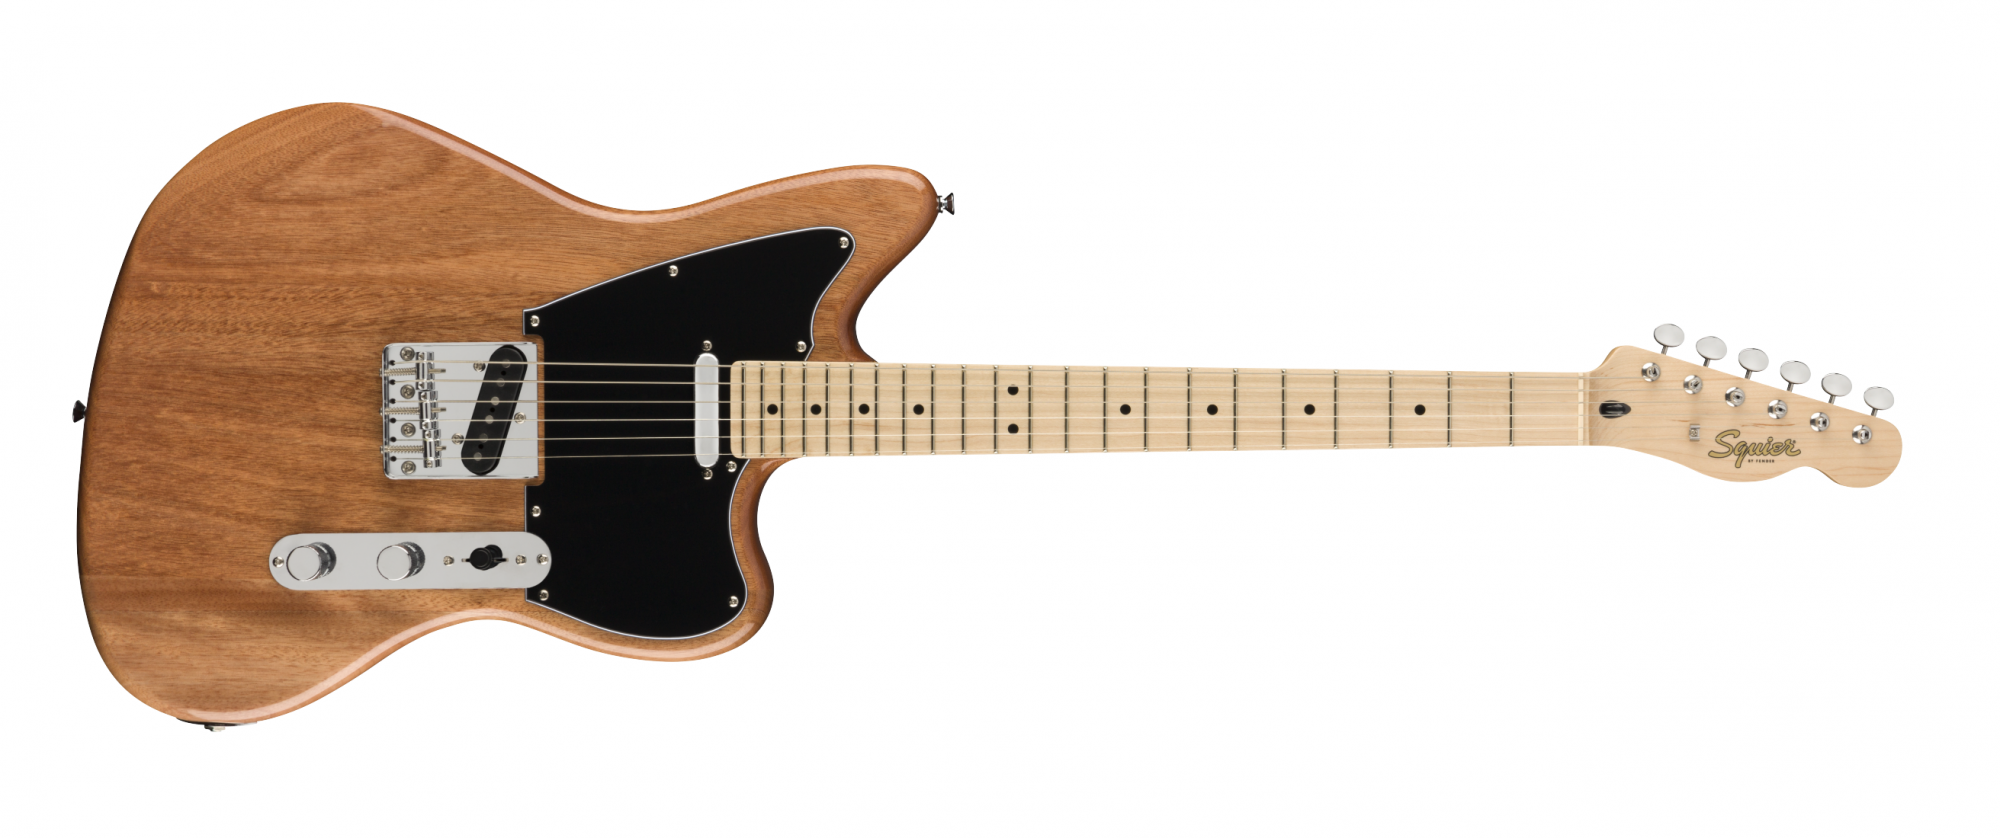 Fender Squier Paranormal Offset Telecaster, Maple Fingerboard, Natural